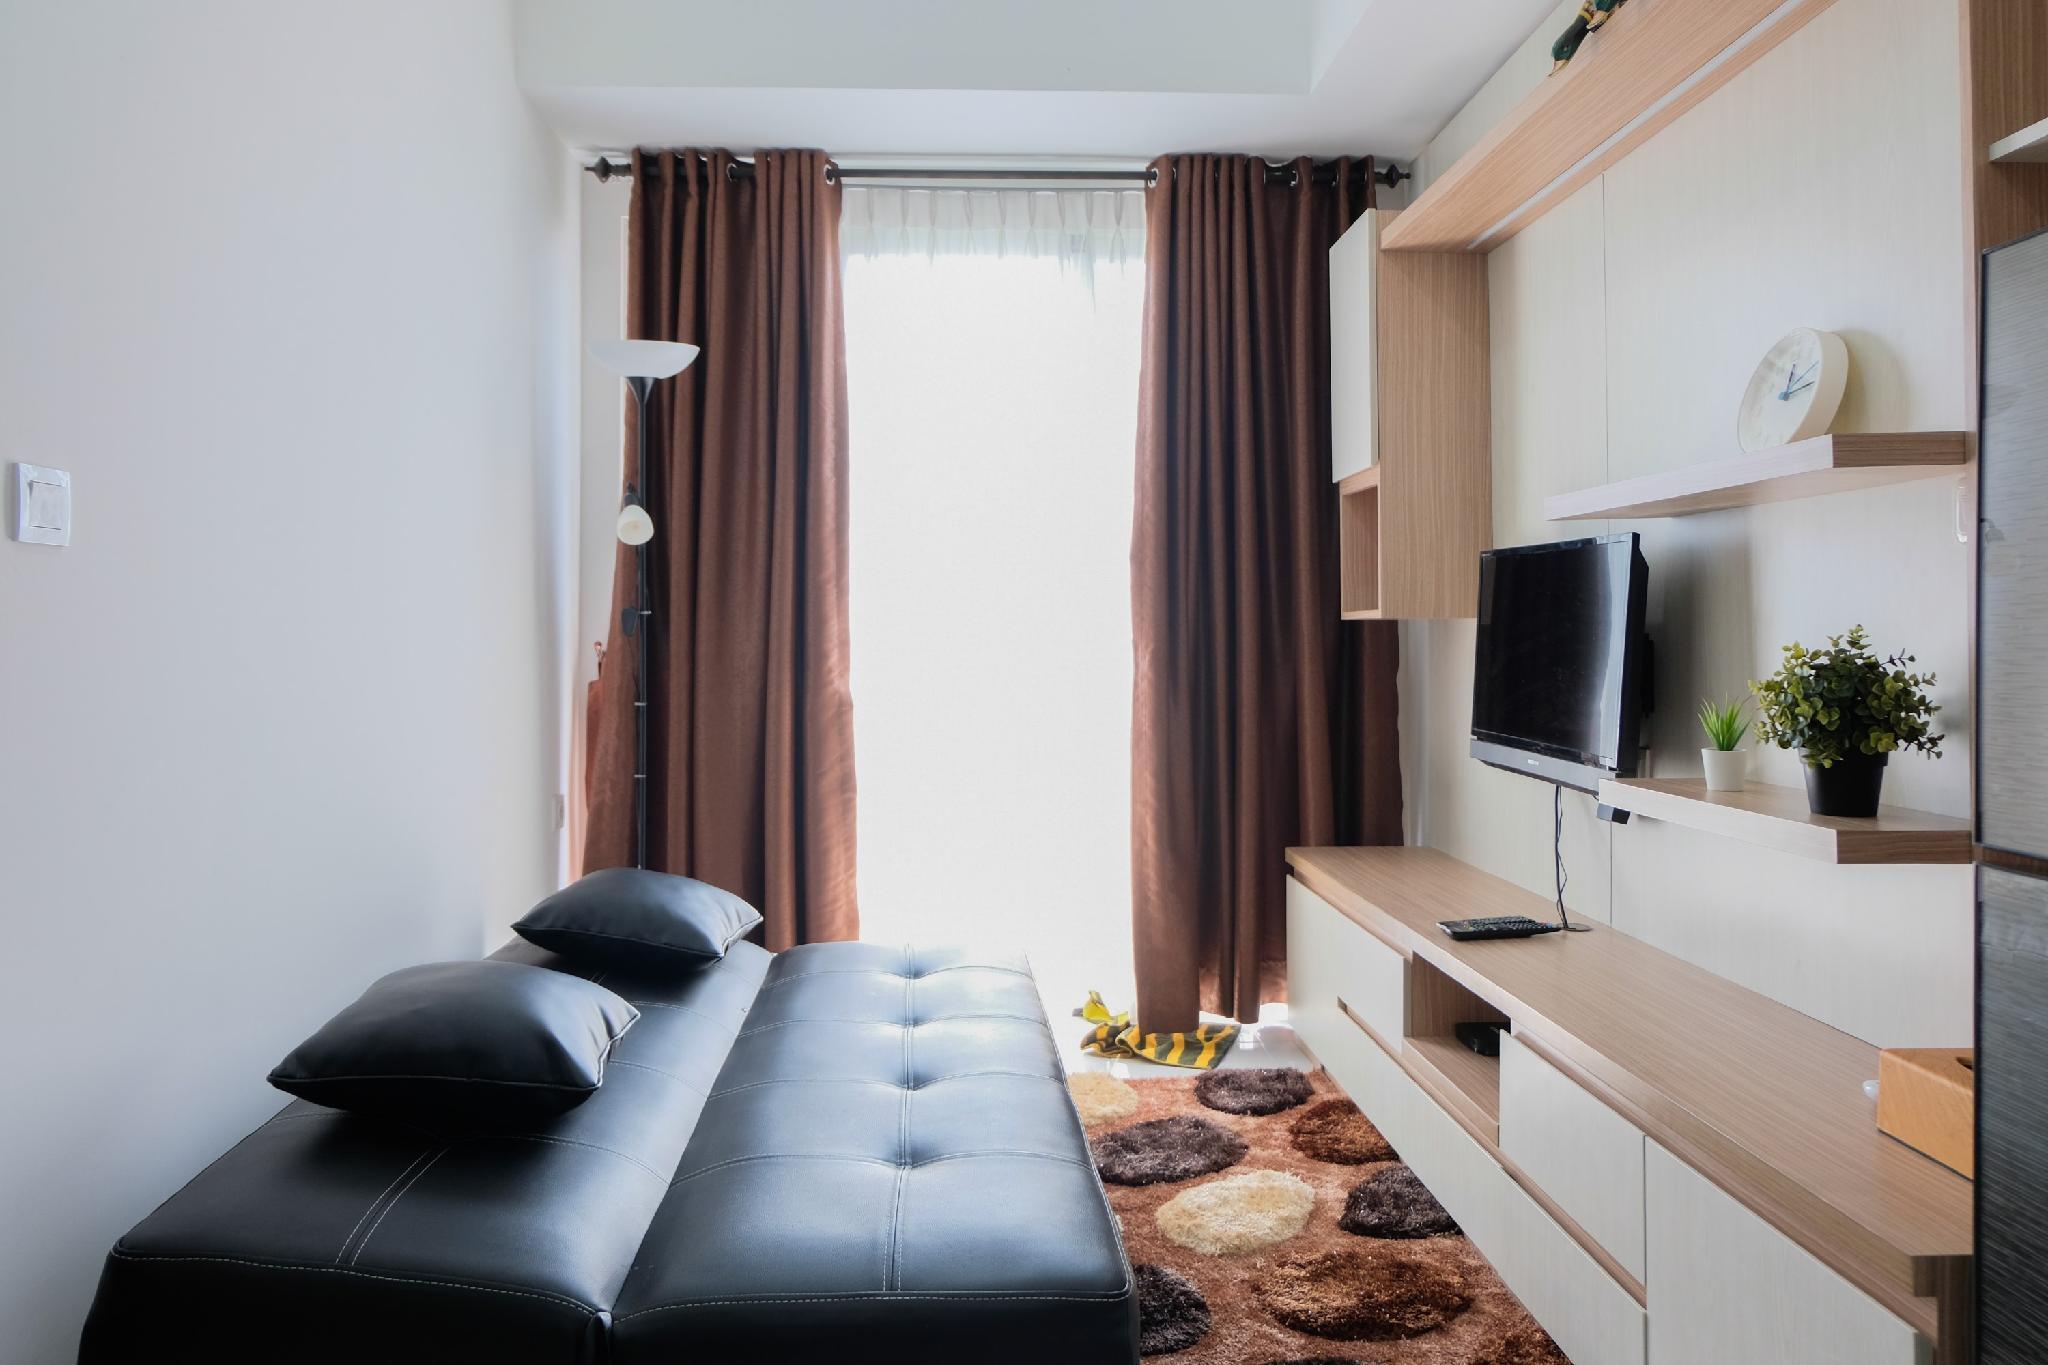 Relaxing 1BR Room Casa De Parco Apt By Travelio